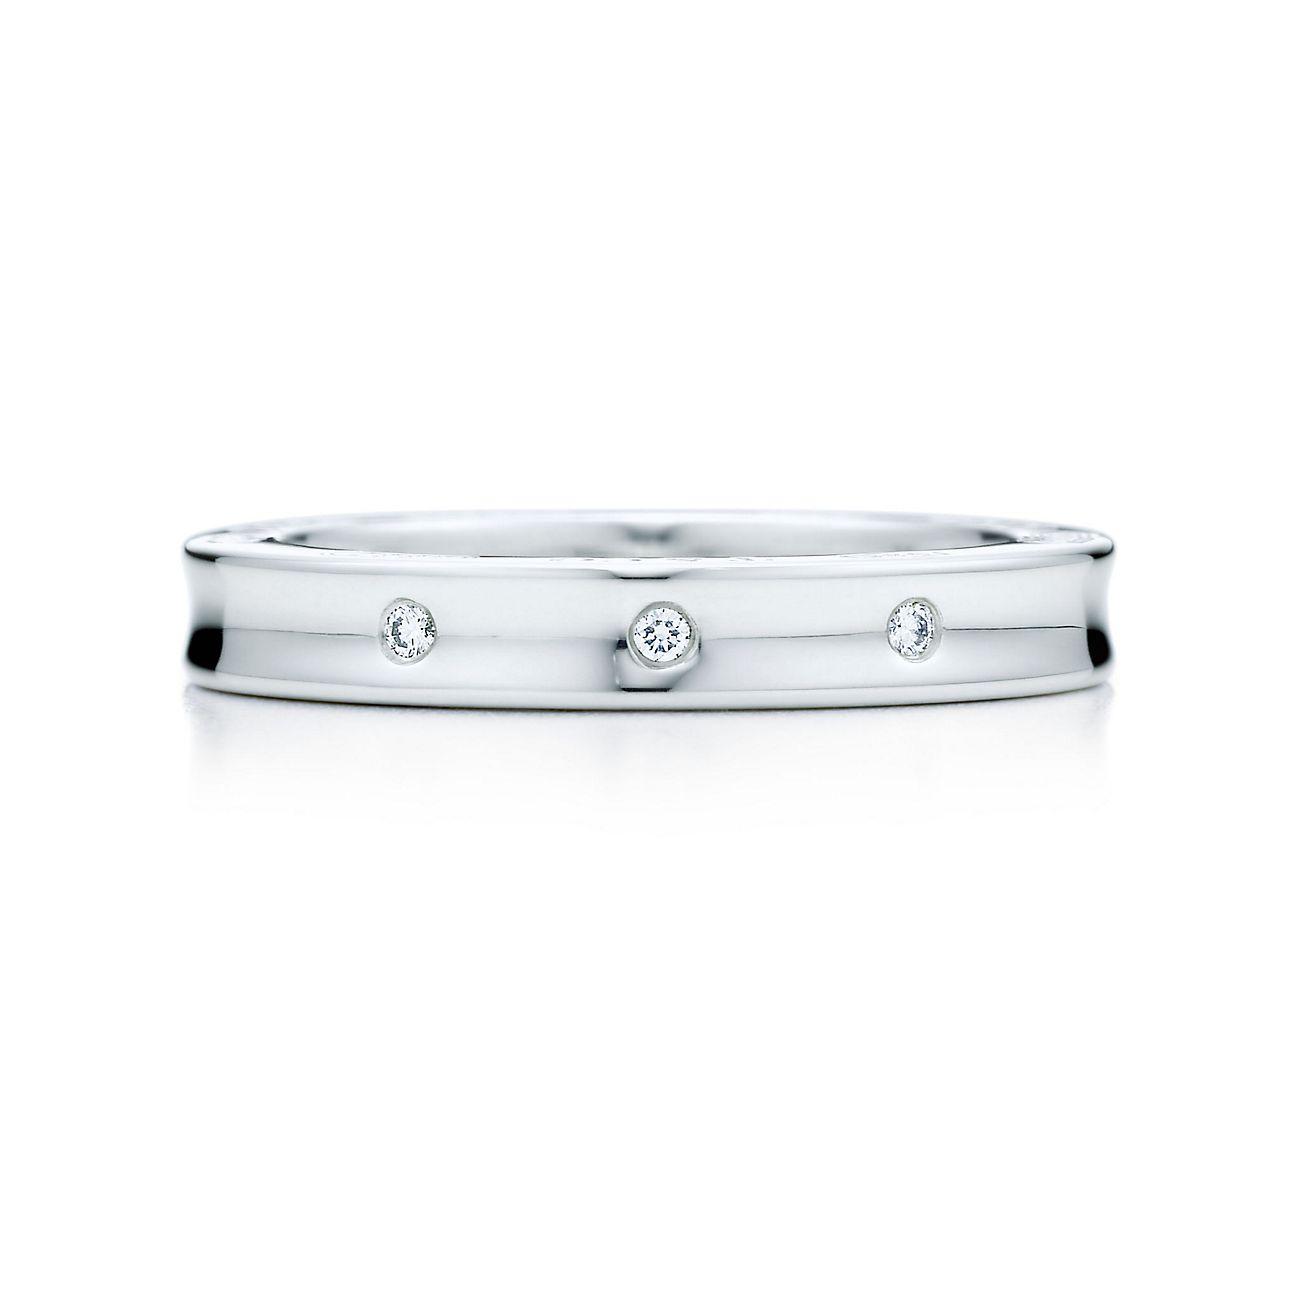 Explore Items Tiffany 1837 Ring 23897547 Tiffany 1837 Ring